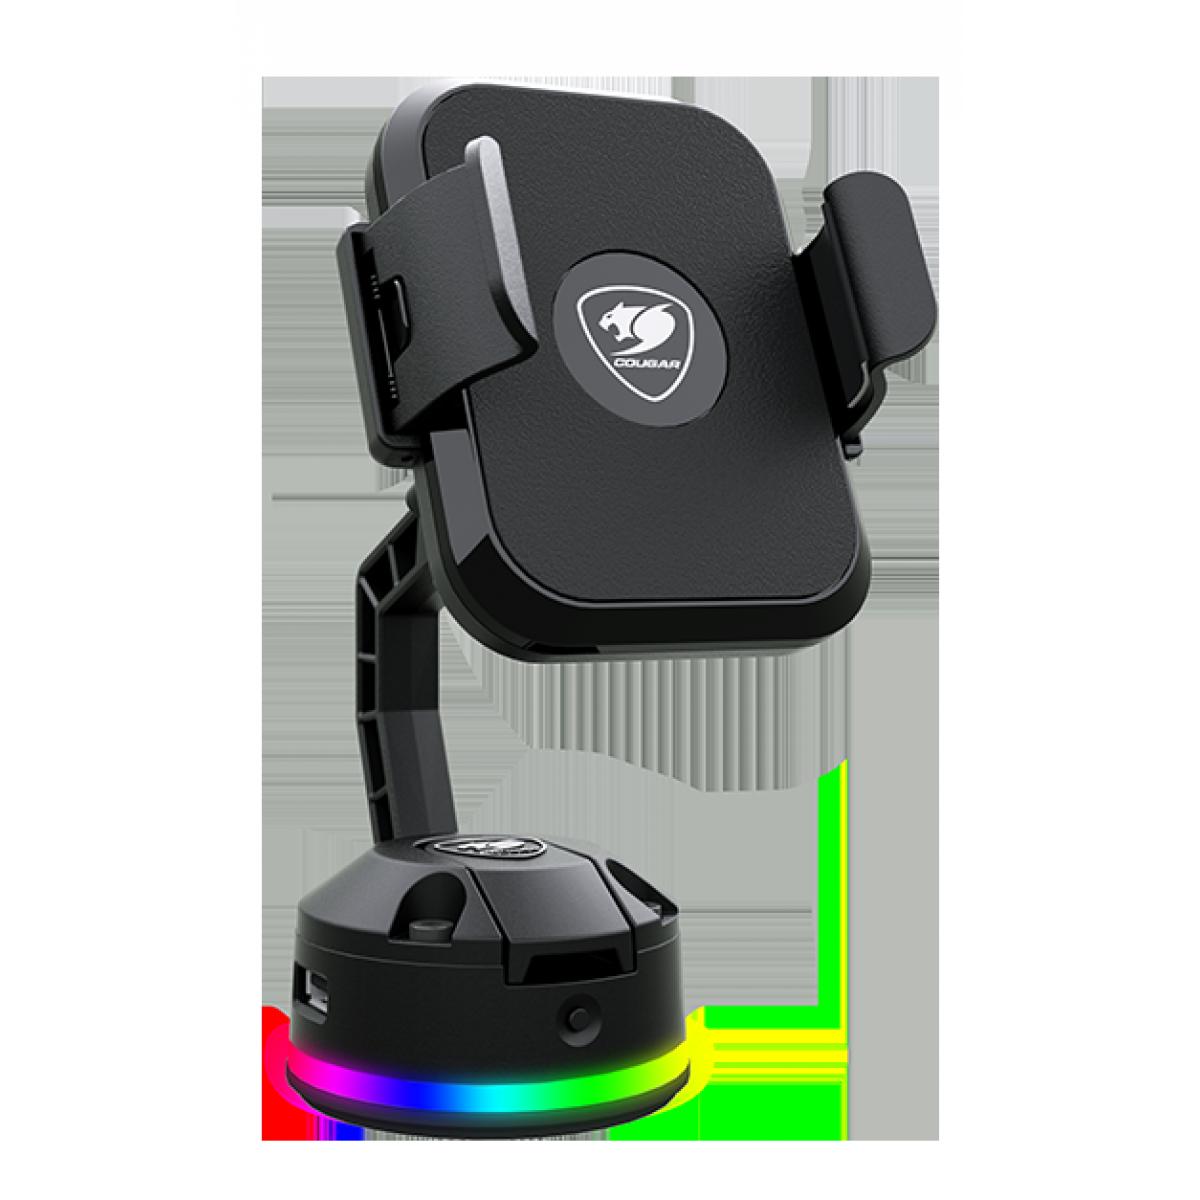 Suporte de Carregamento Wireless para Celular Cougar Bunker M RGB, Black, 3MBMRXXB.0001